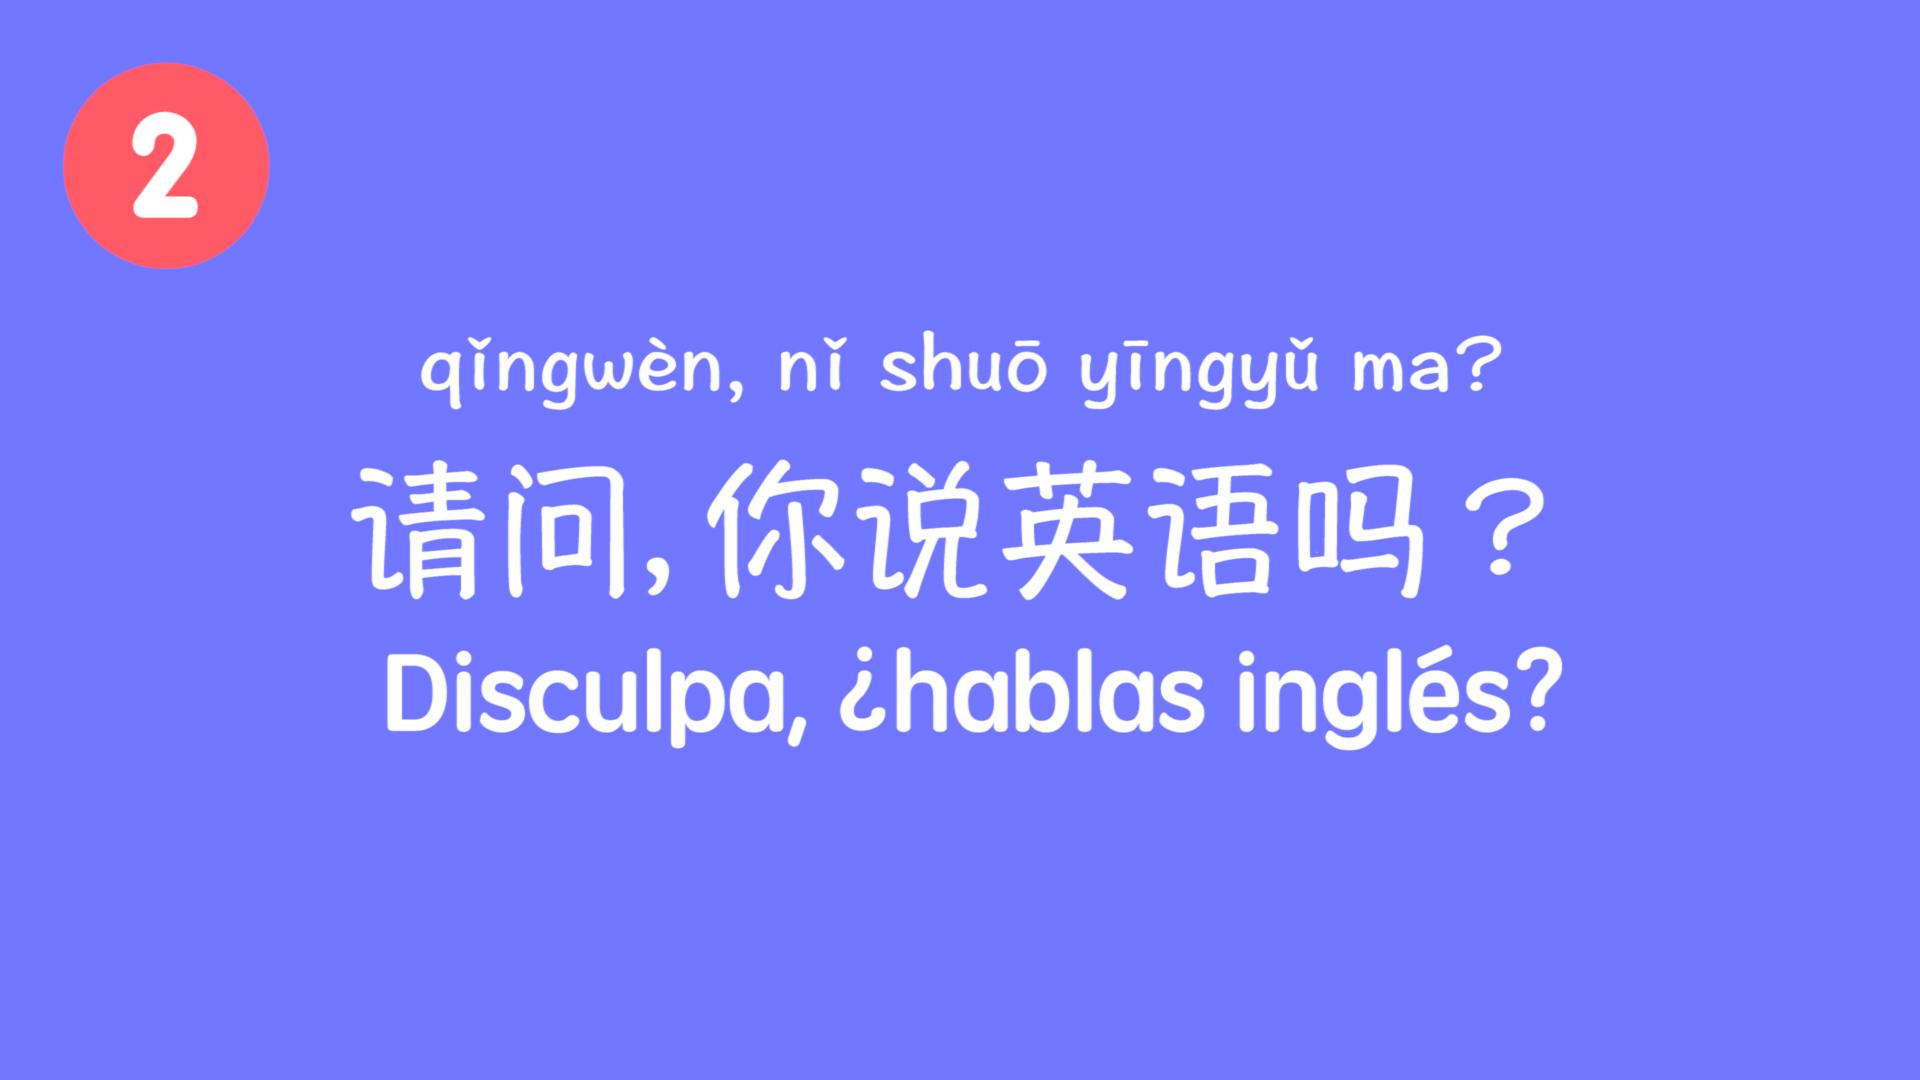 12 Frases Que Debes Saber Al Venir A China Aprende Chino